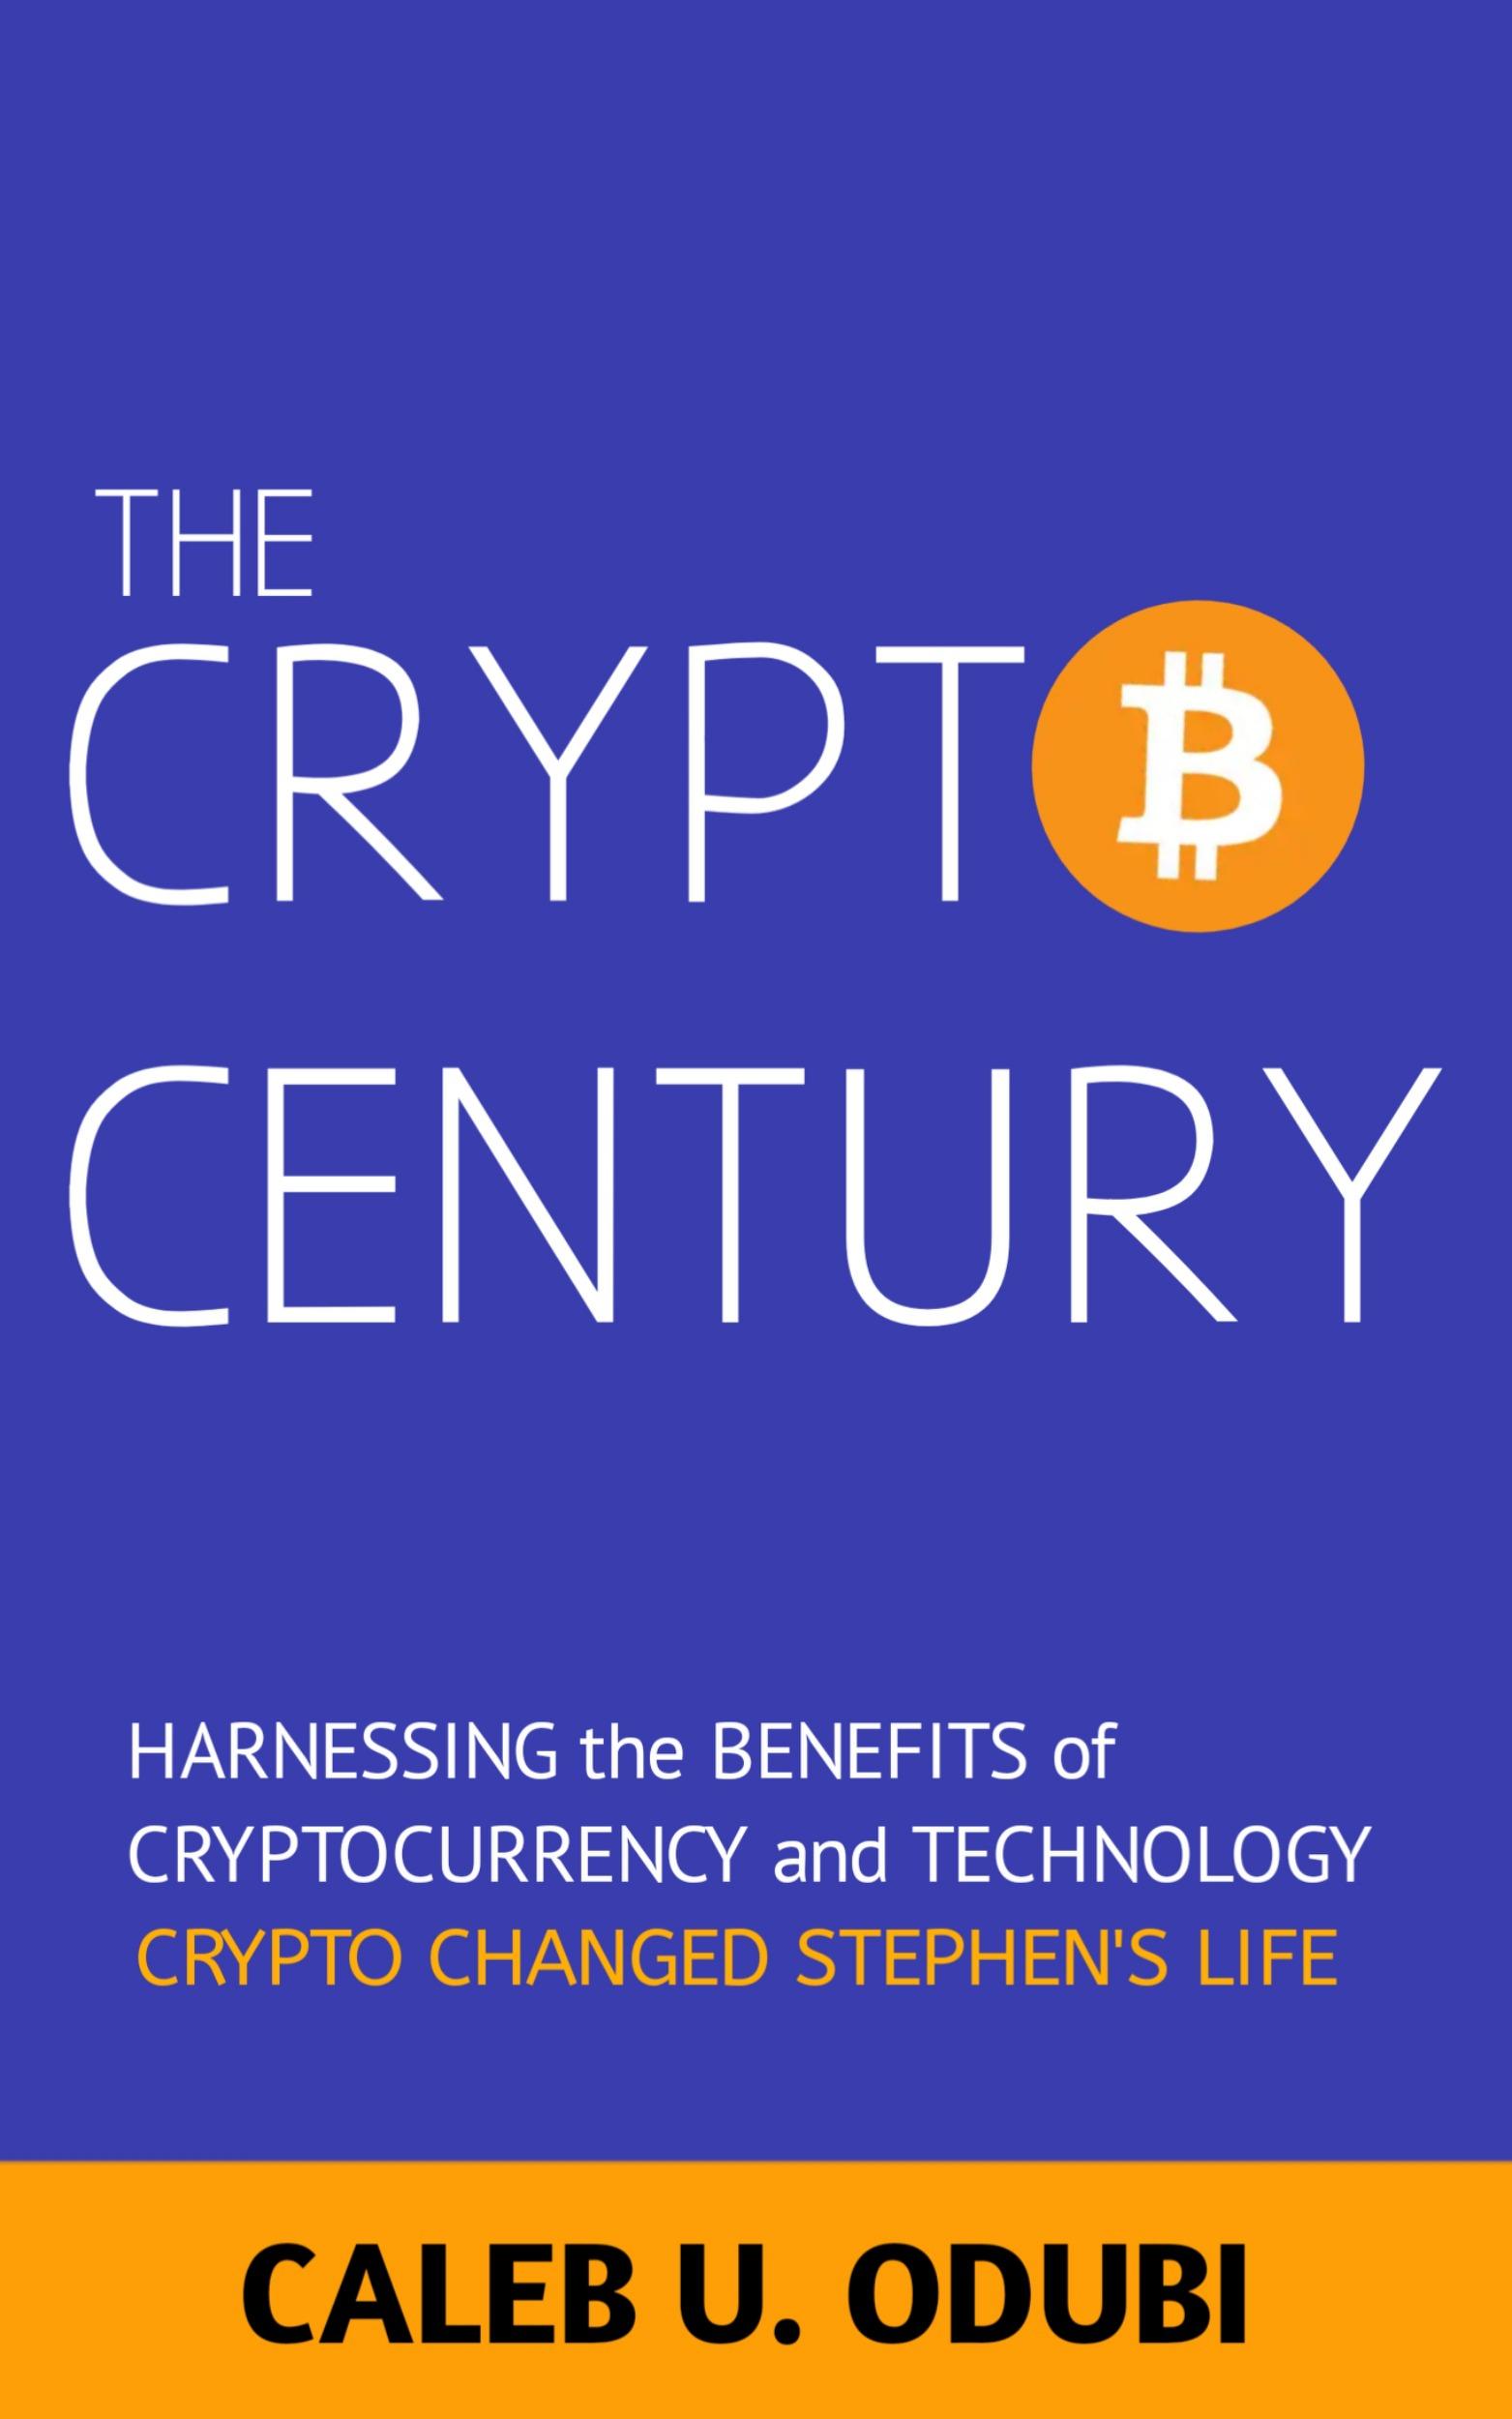 THE CRYPTO CENTURY